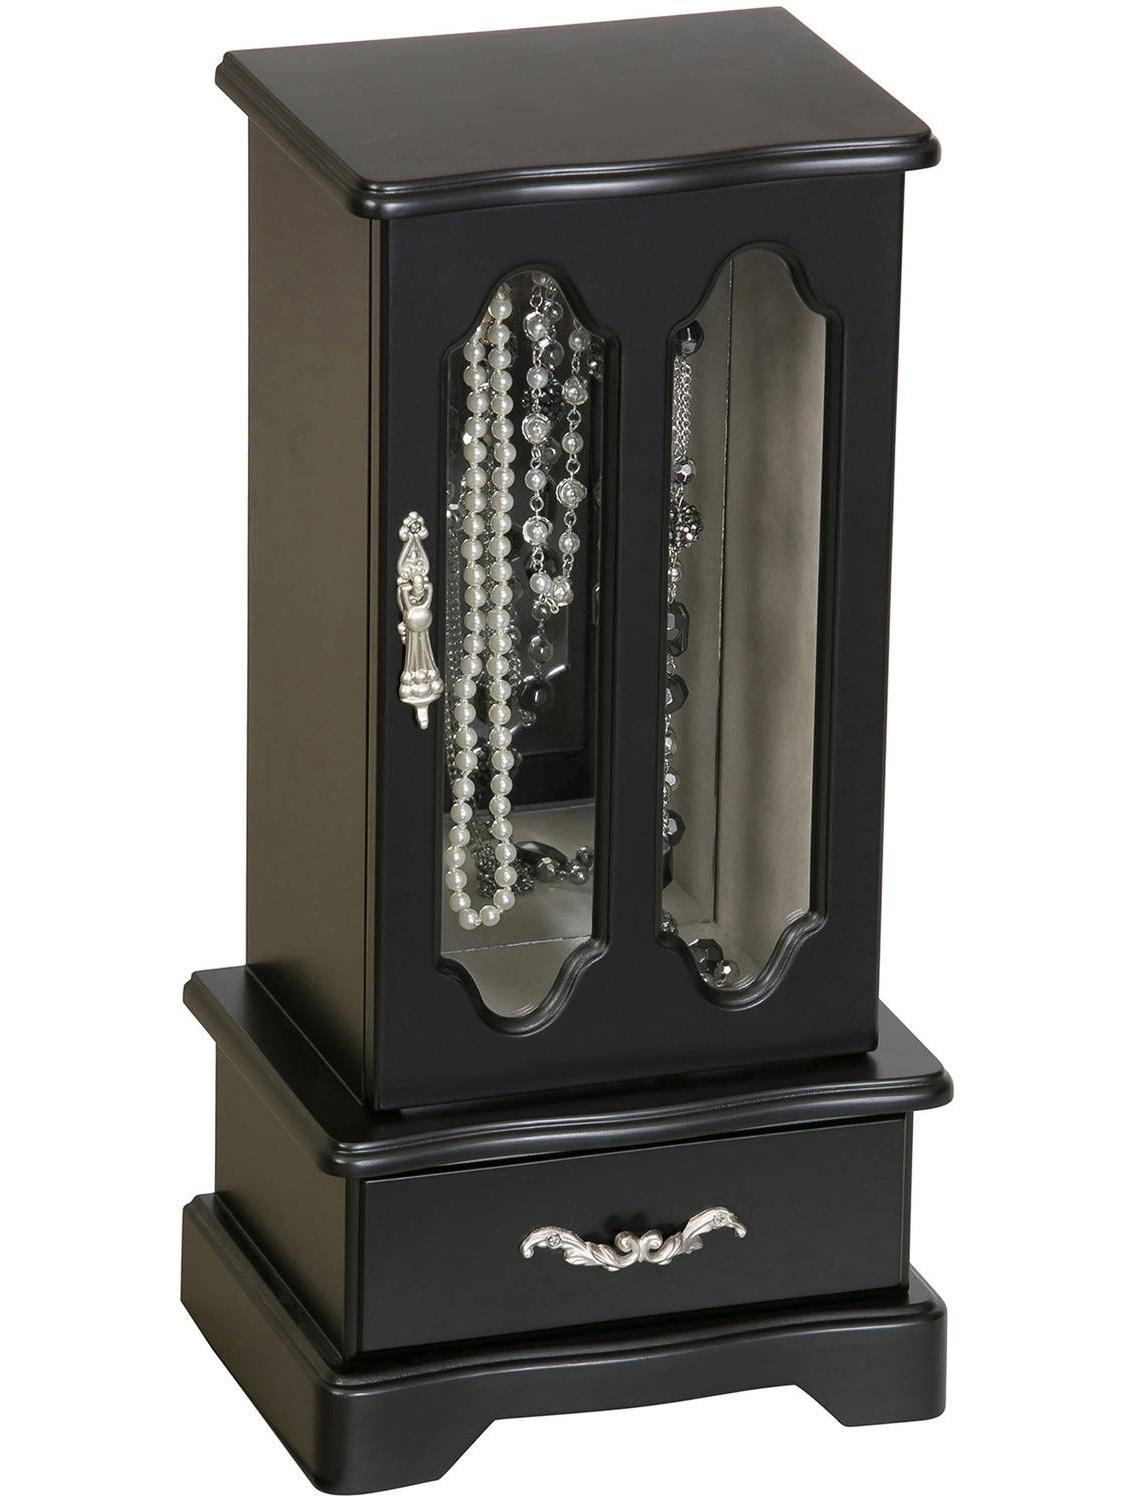 Townsend Wooden Jewelry Box, Java Finish